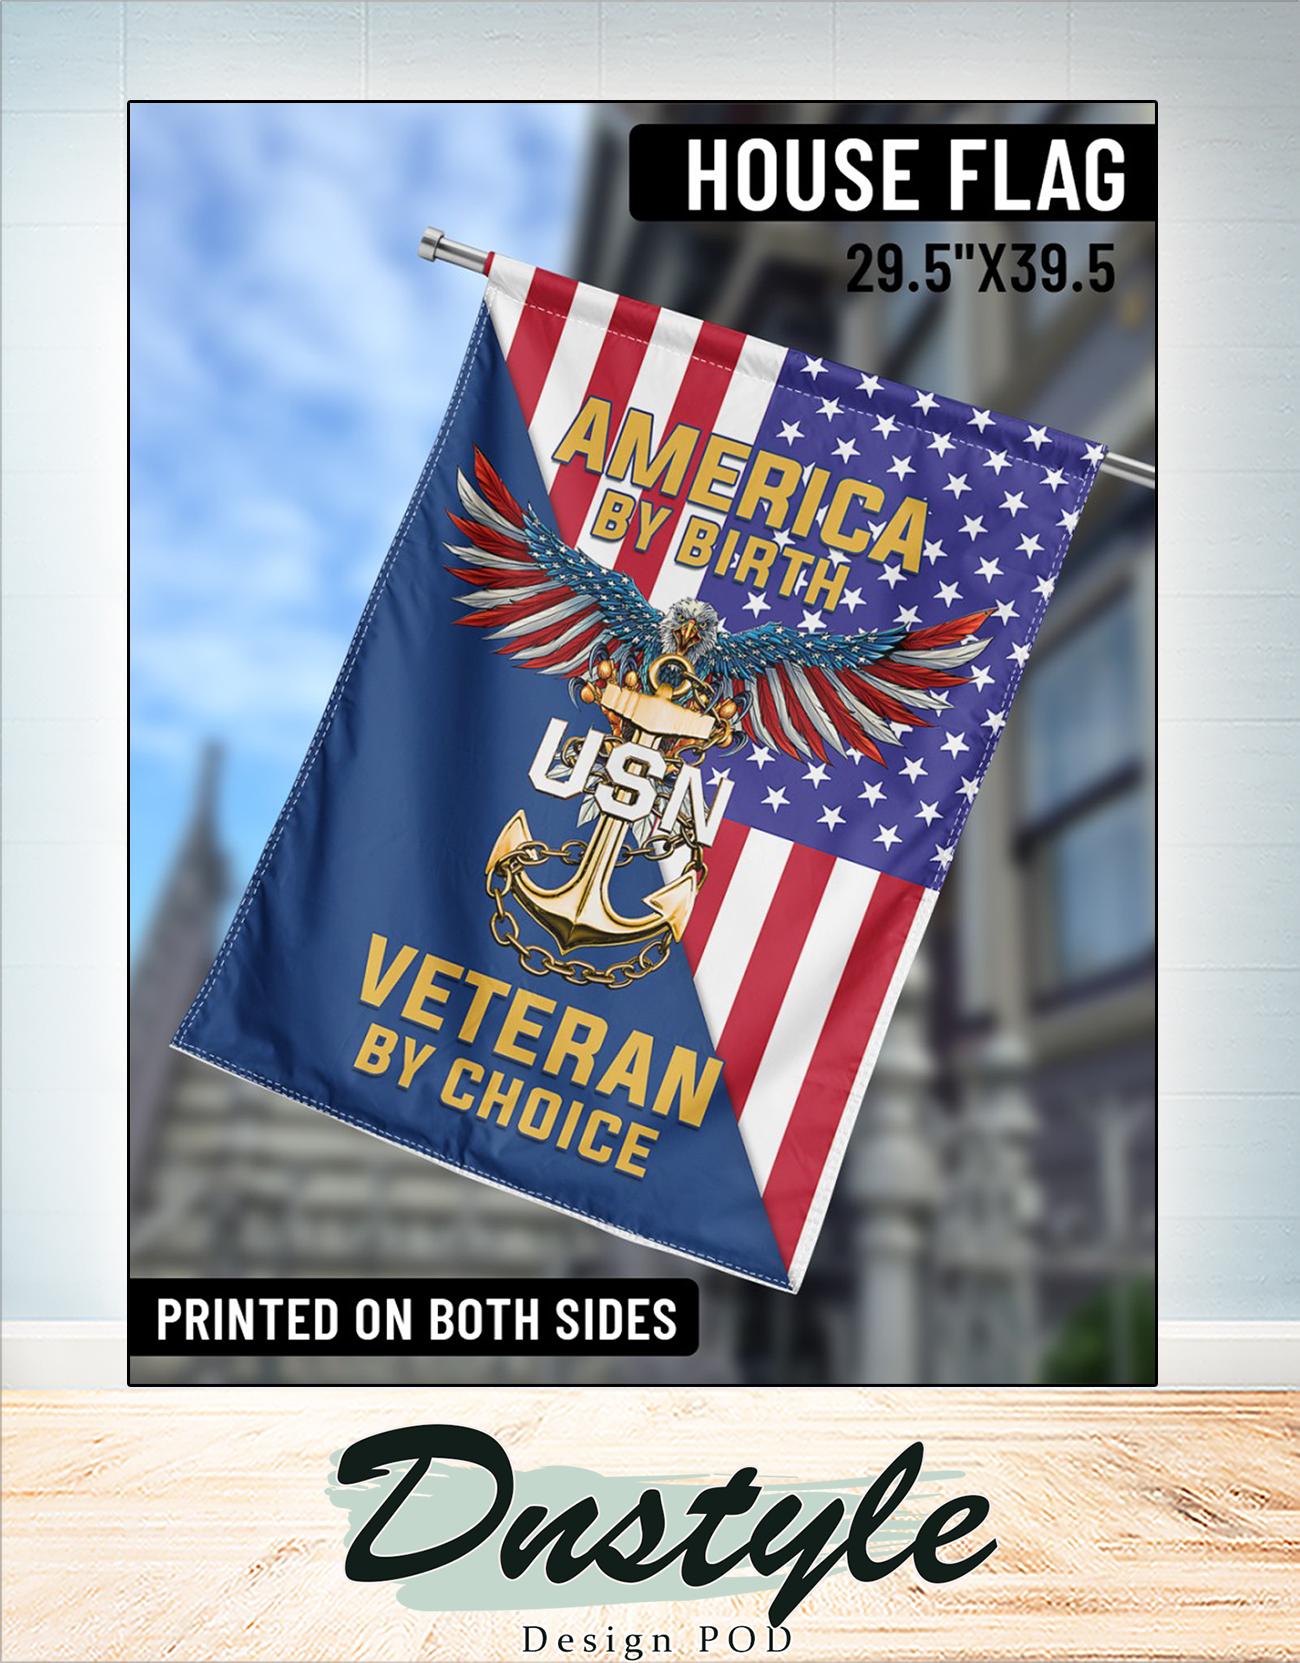 America by birth veteran by choice flag 2